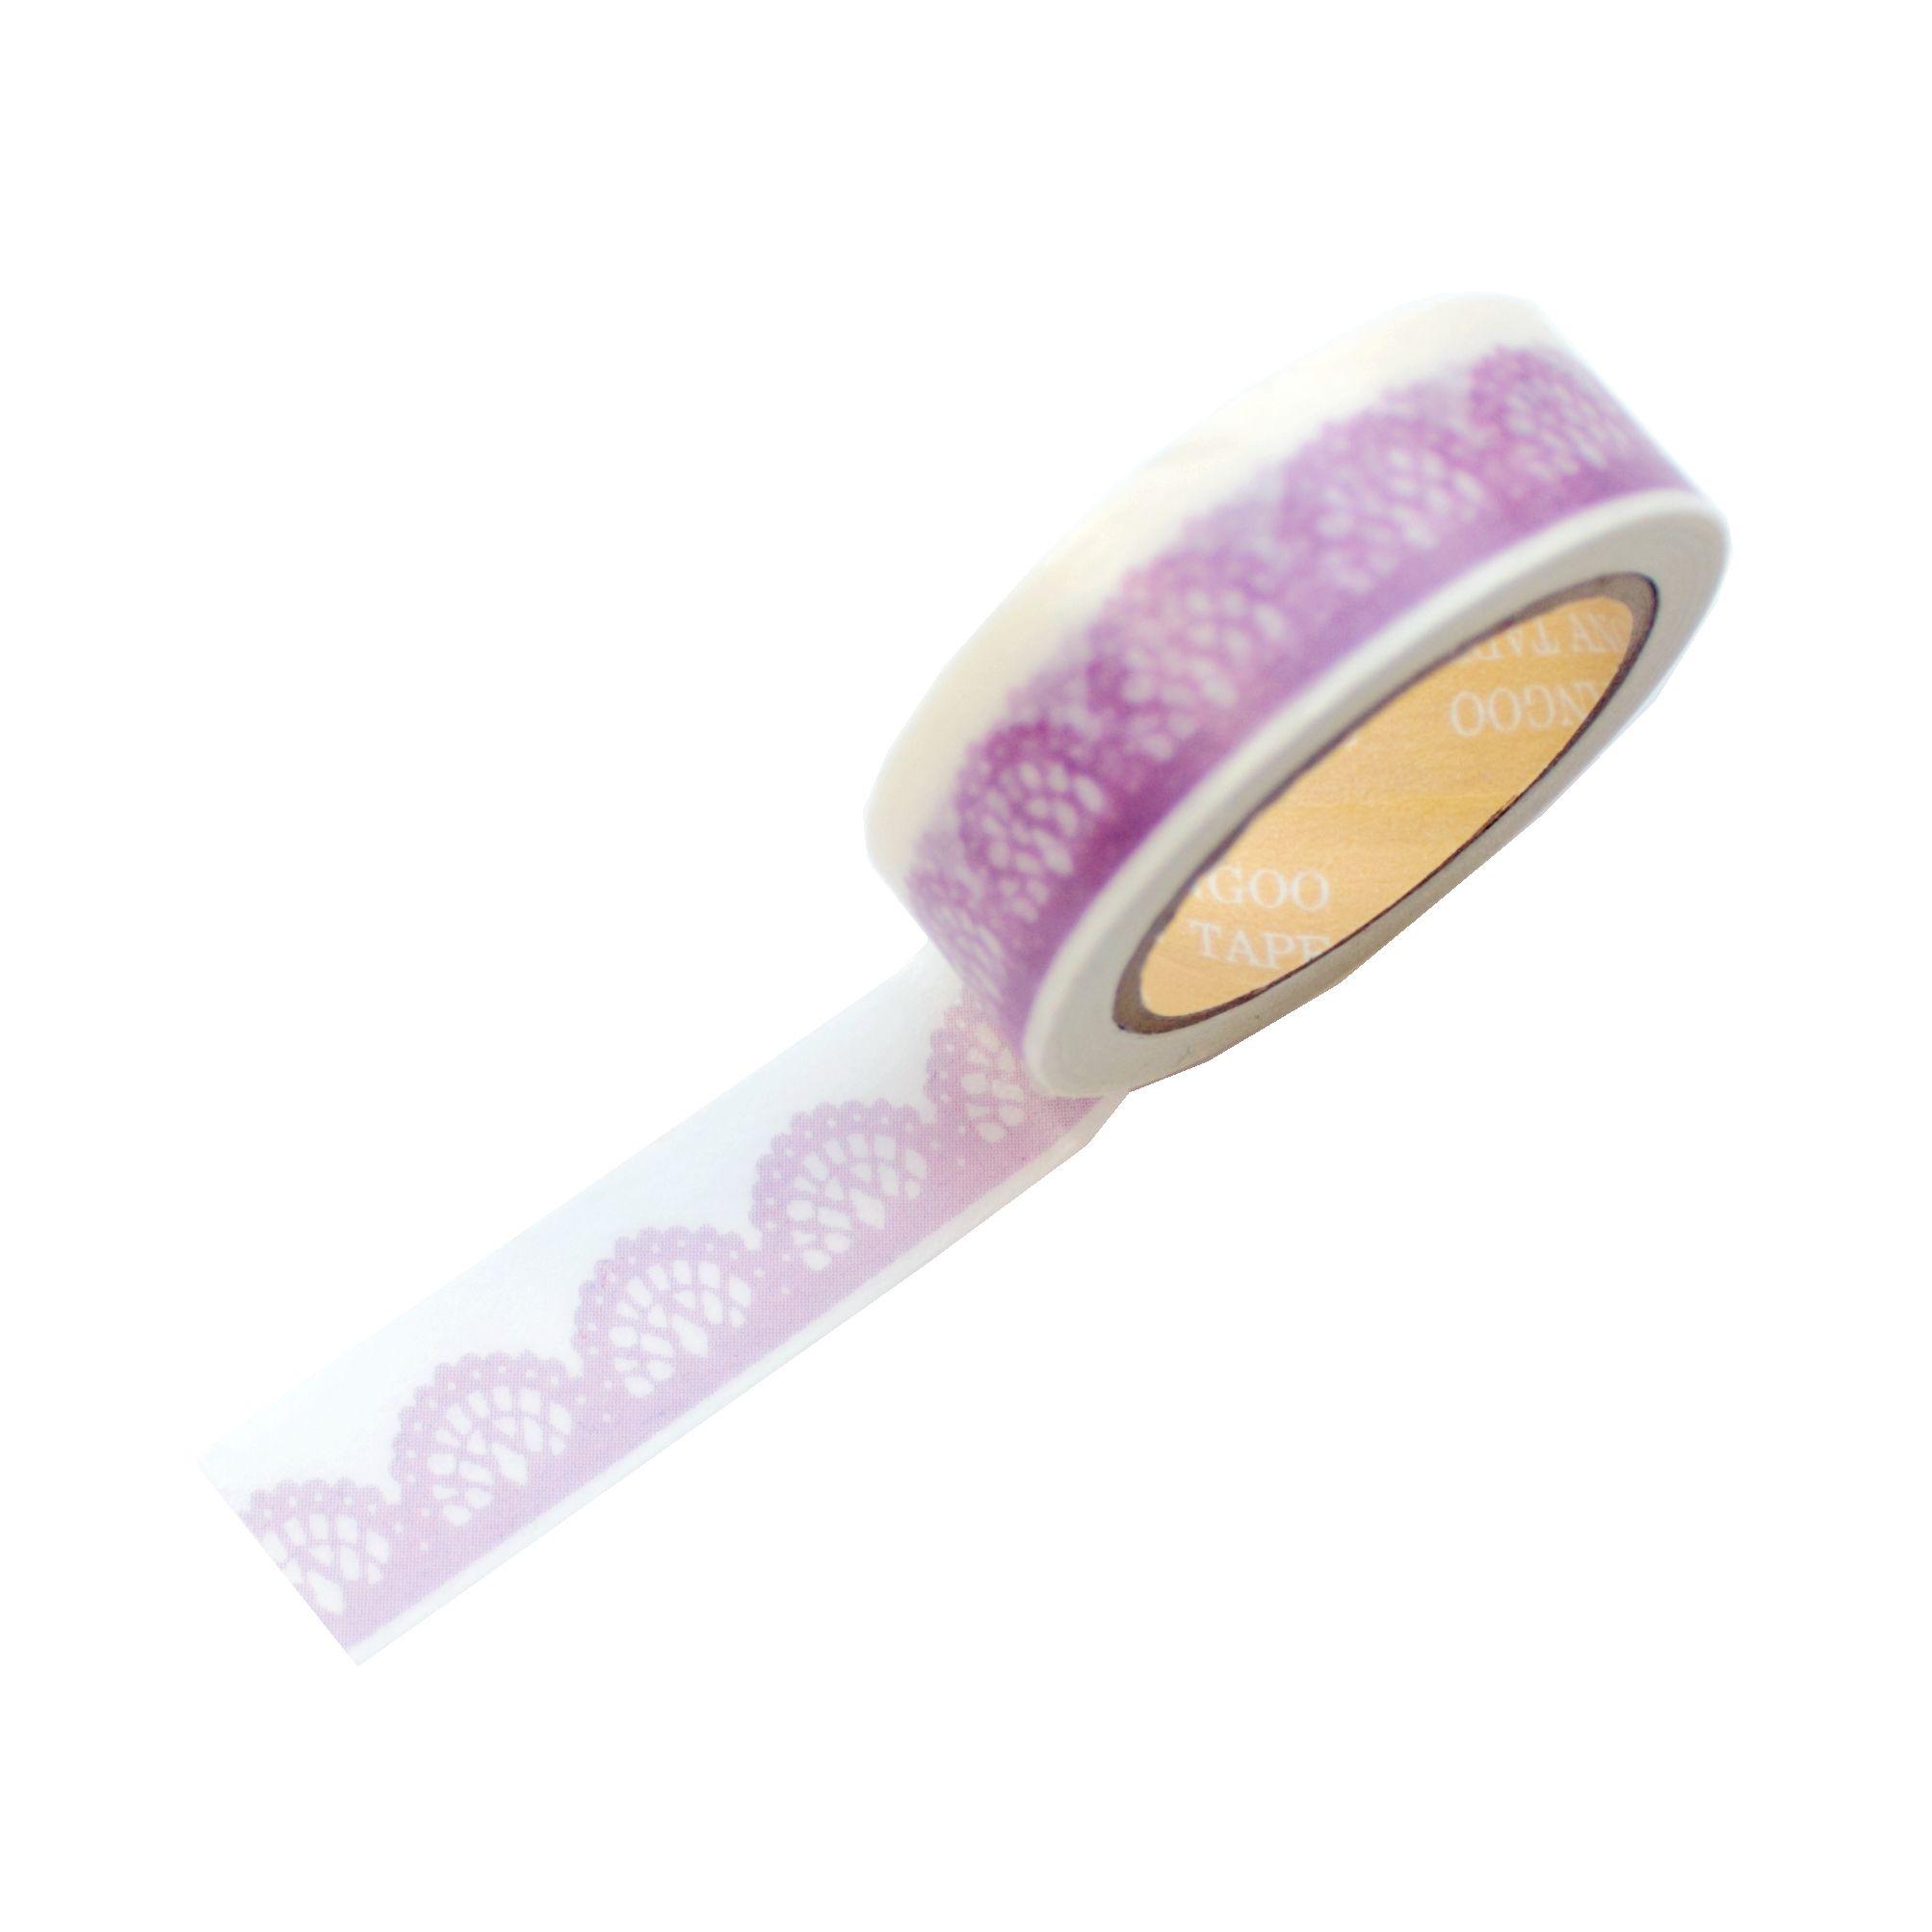 Washi tape dentelle mauve : http://www.belledecoeur.com/deco-tape.html